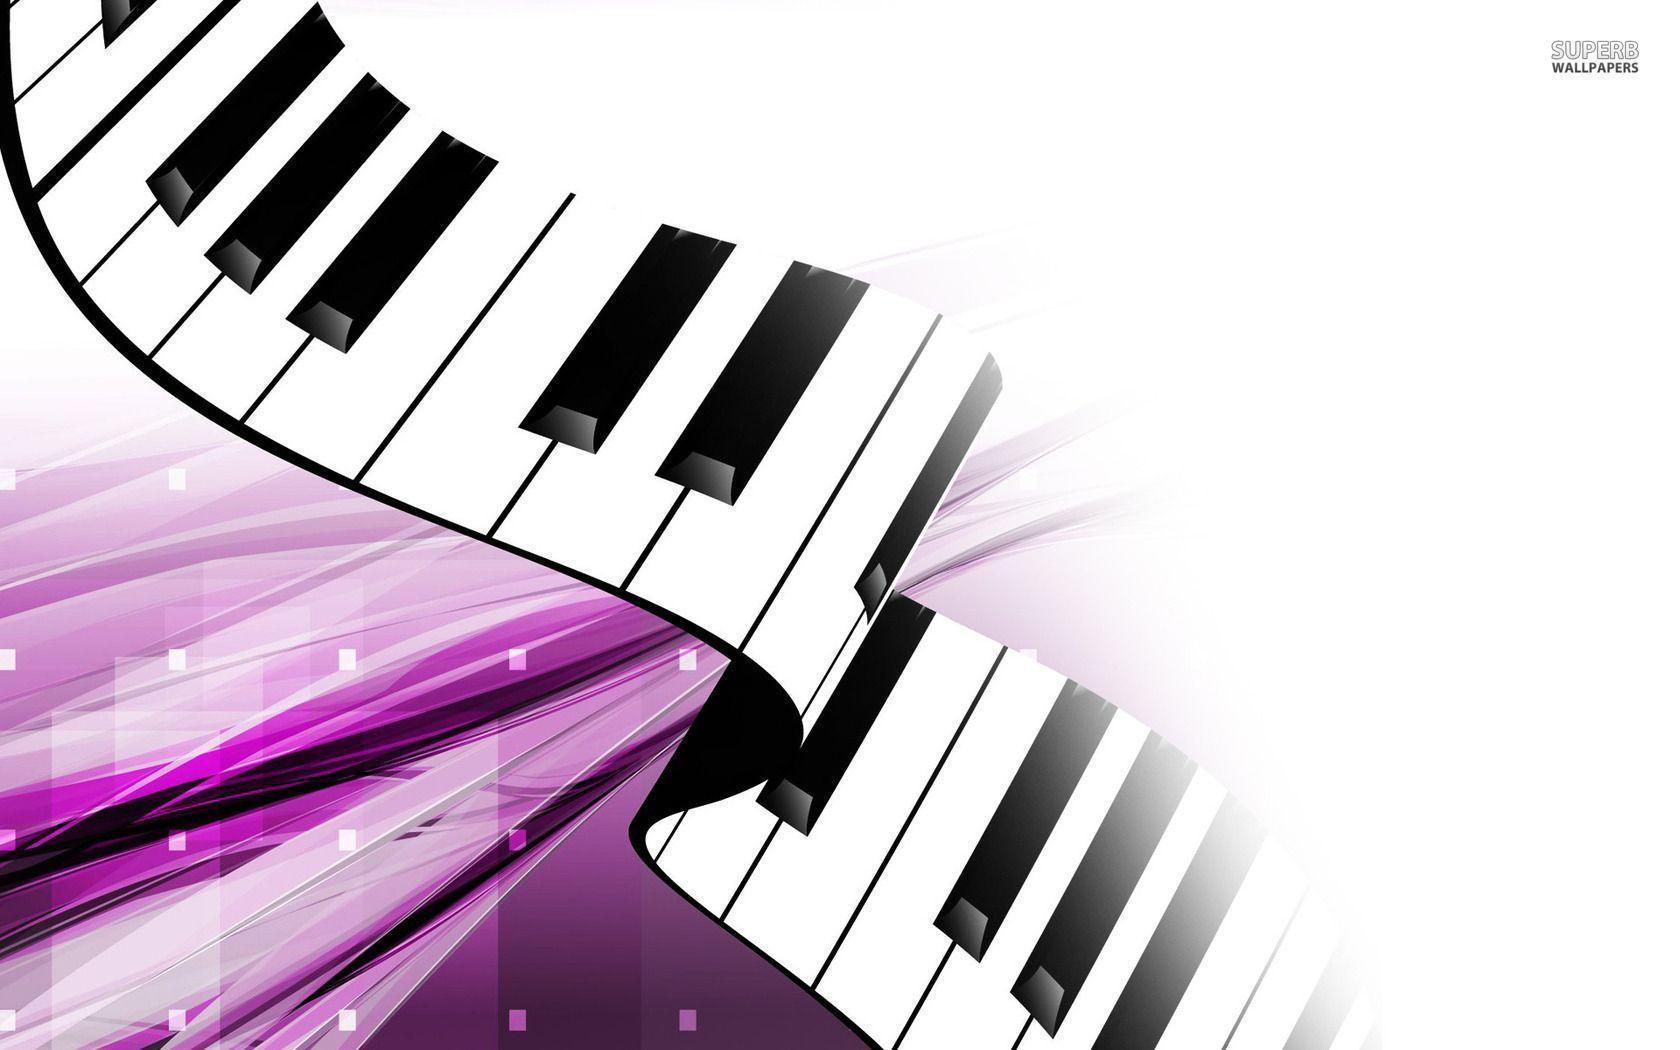 Music Keyboard Wallpapers - Wallpaper Cave